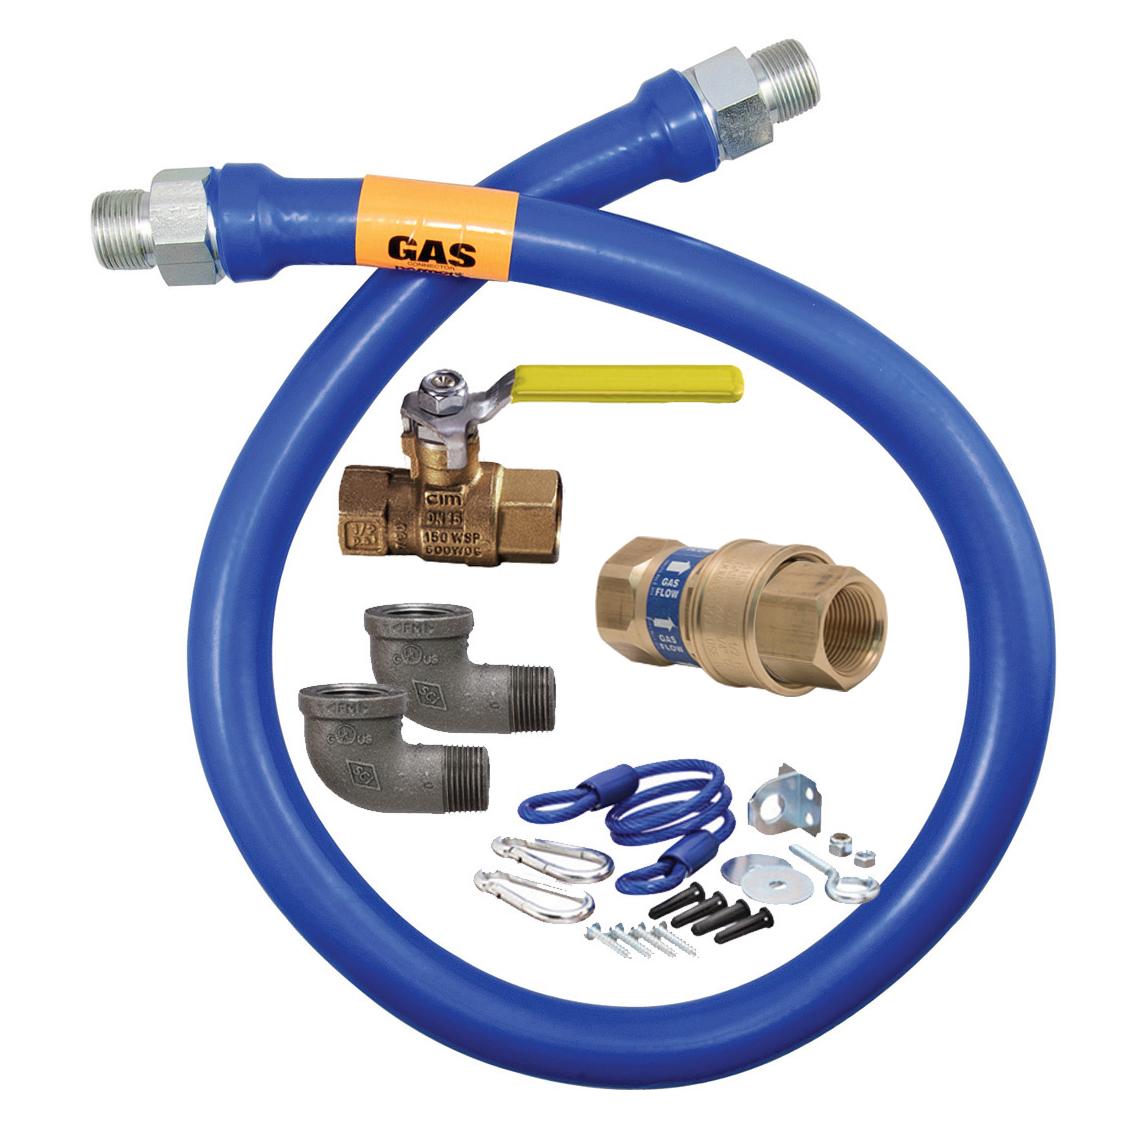 Dormont Manufacturing 1675KITB48 gas connector hose kit